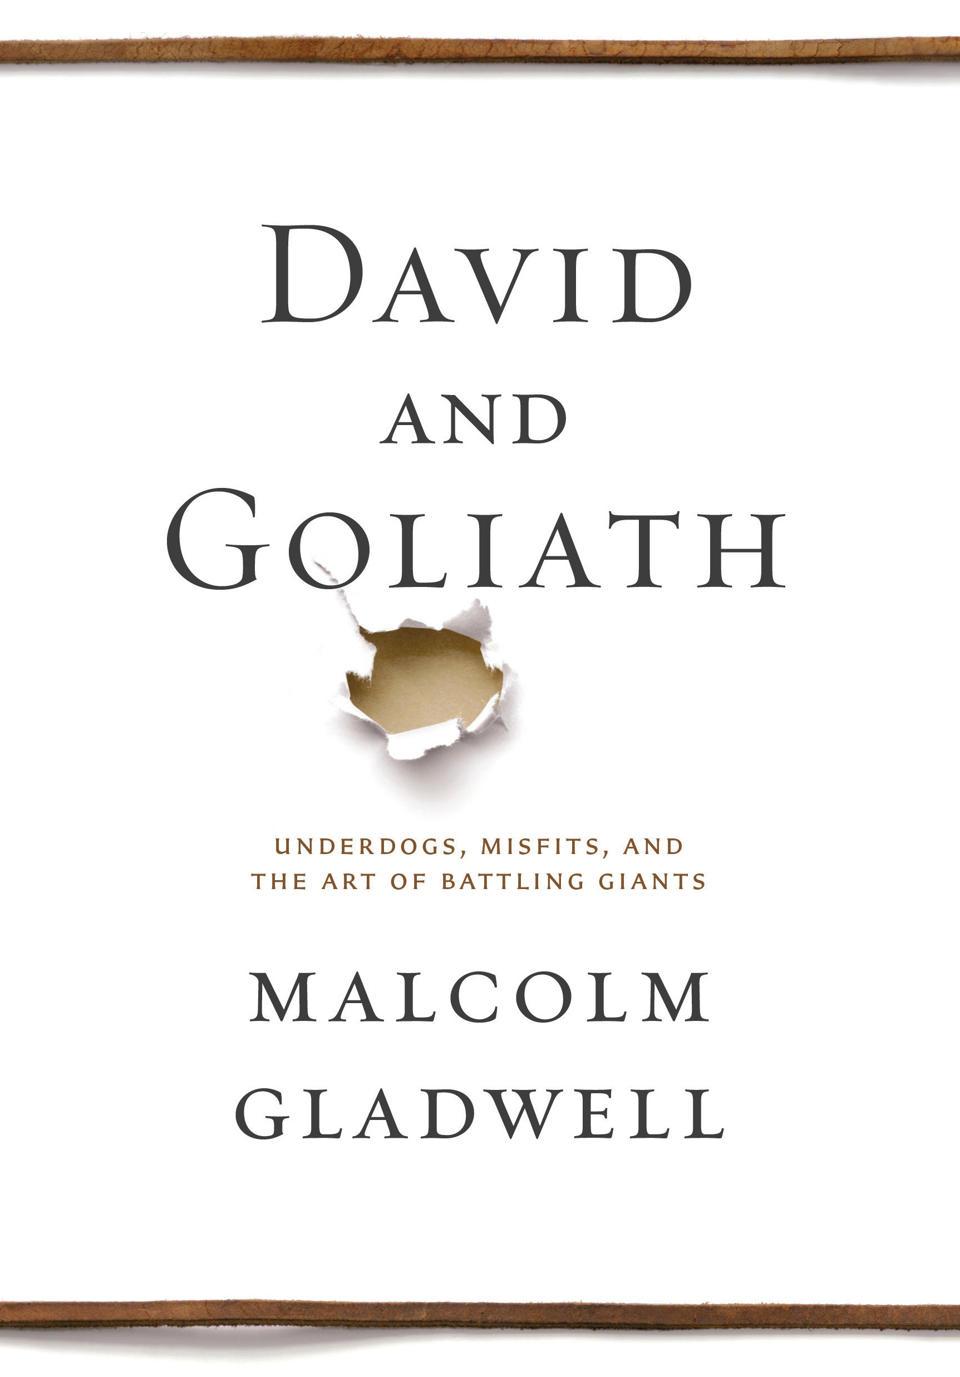 David-and-Goliath.jpg